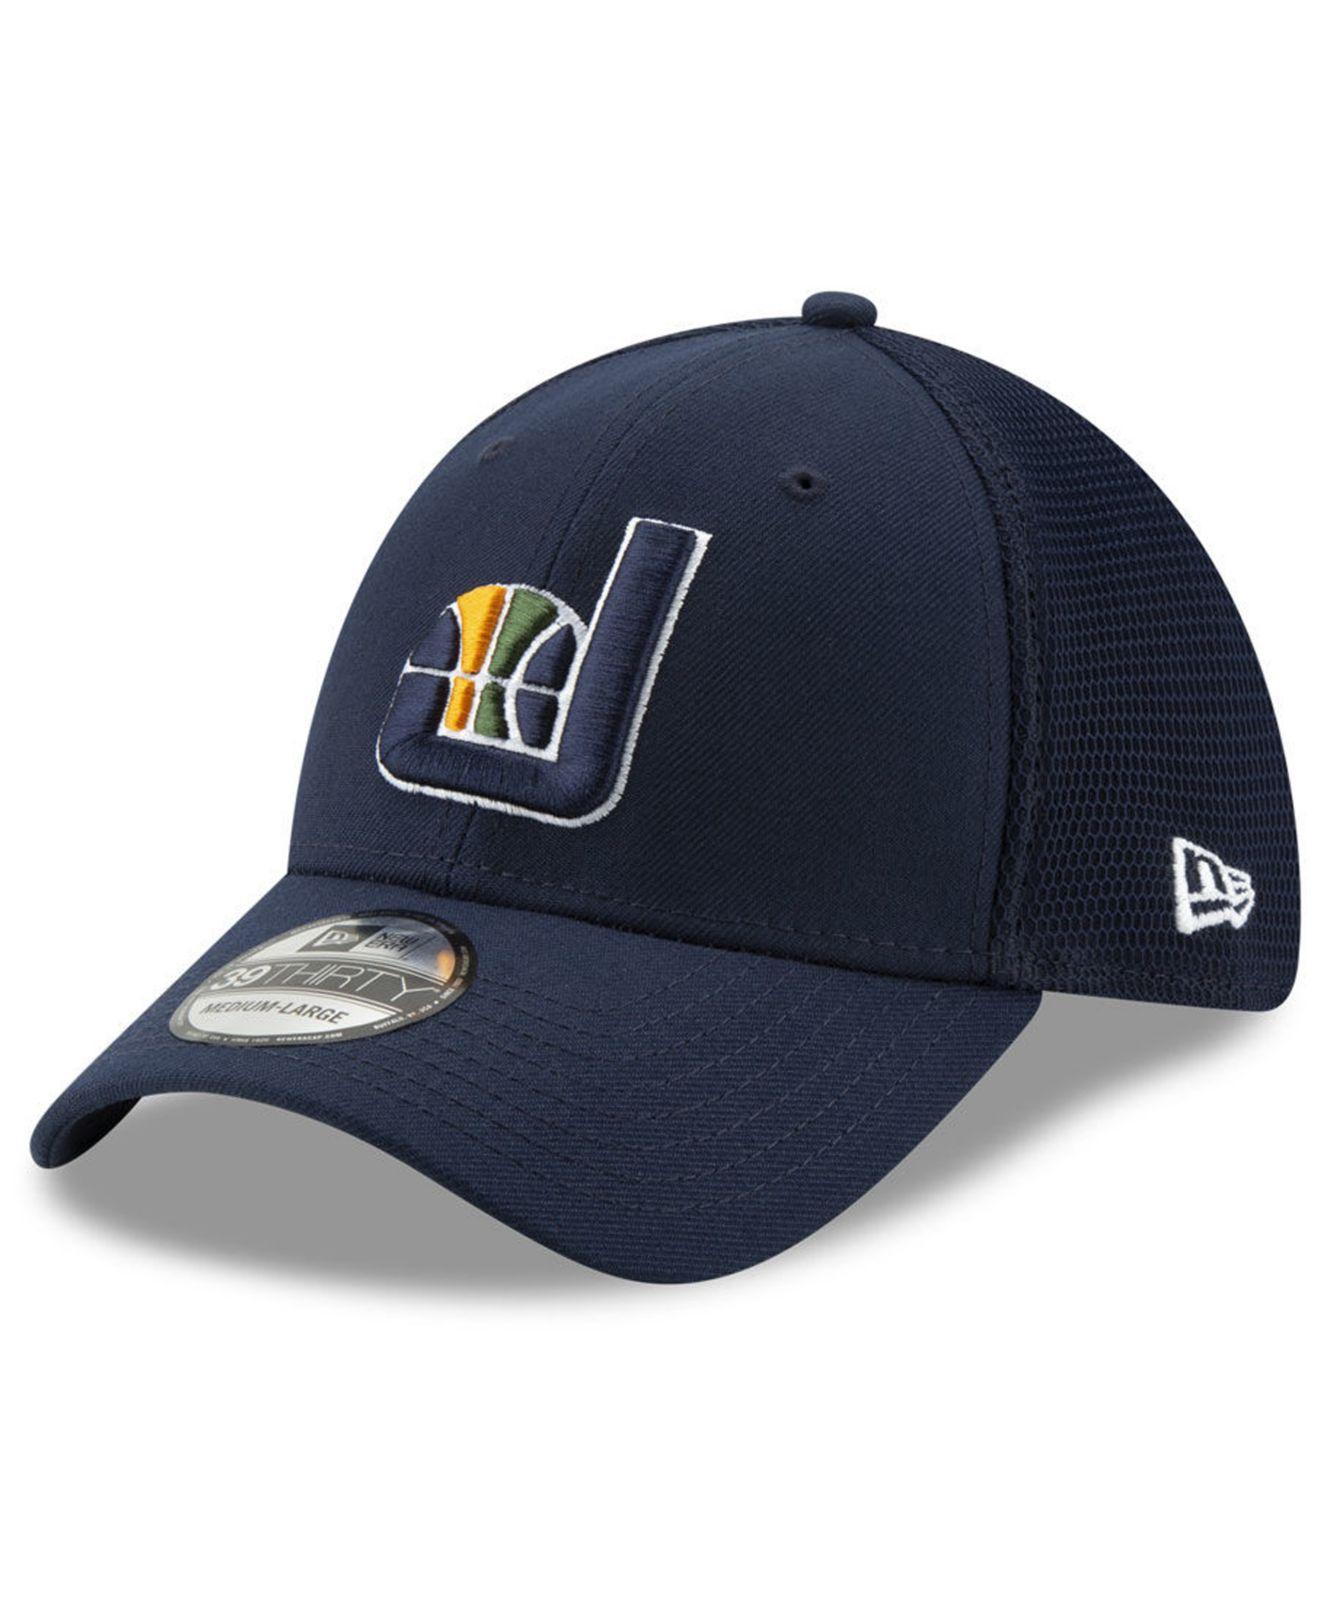 b1a2401d042 Lyst - KTZ Utah Jazz Back Half 39thirty Cap in Blue for Men